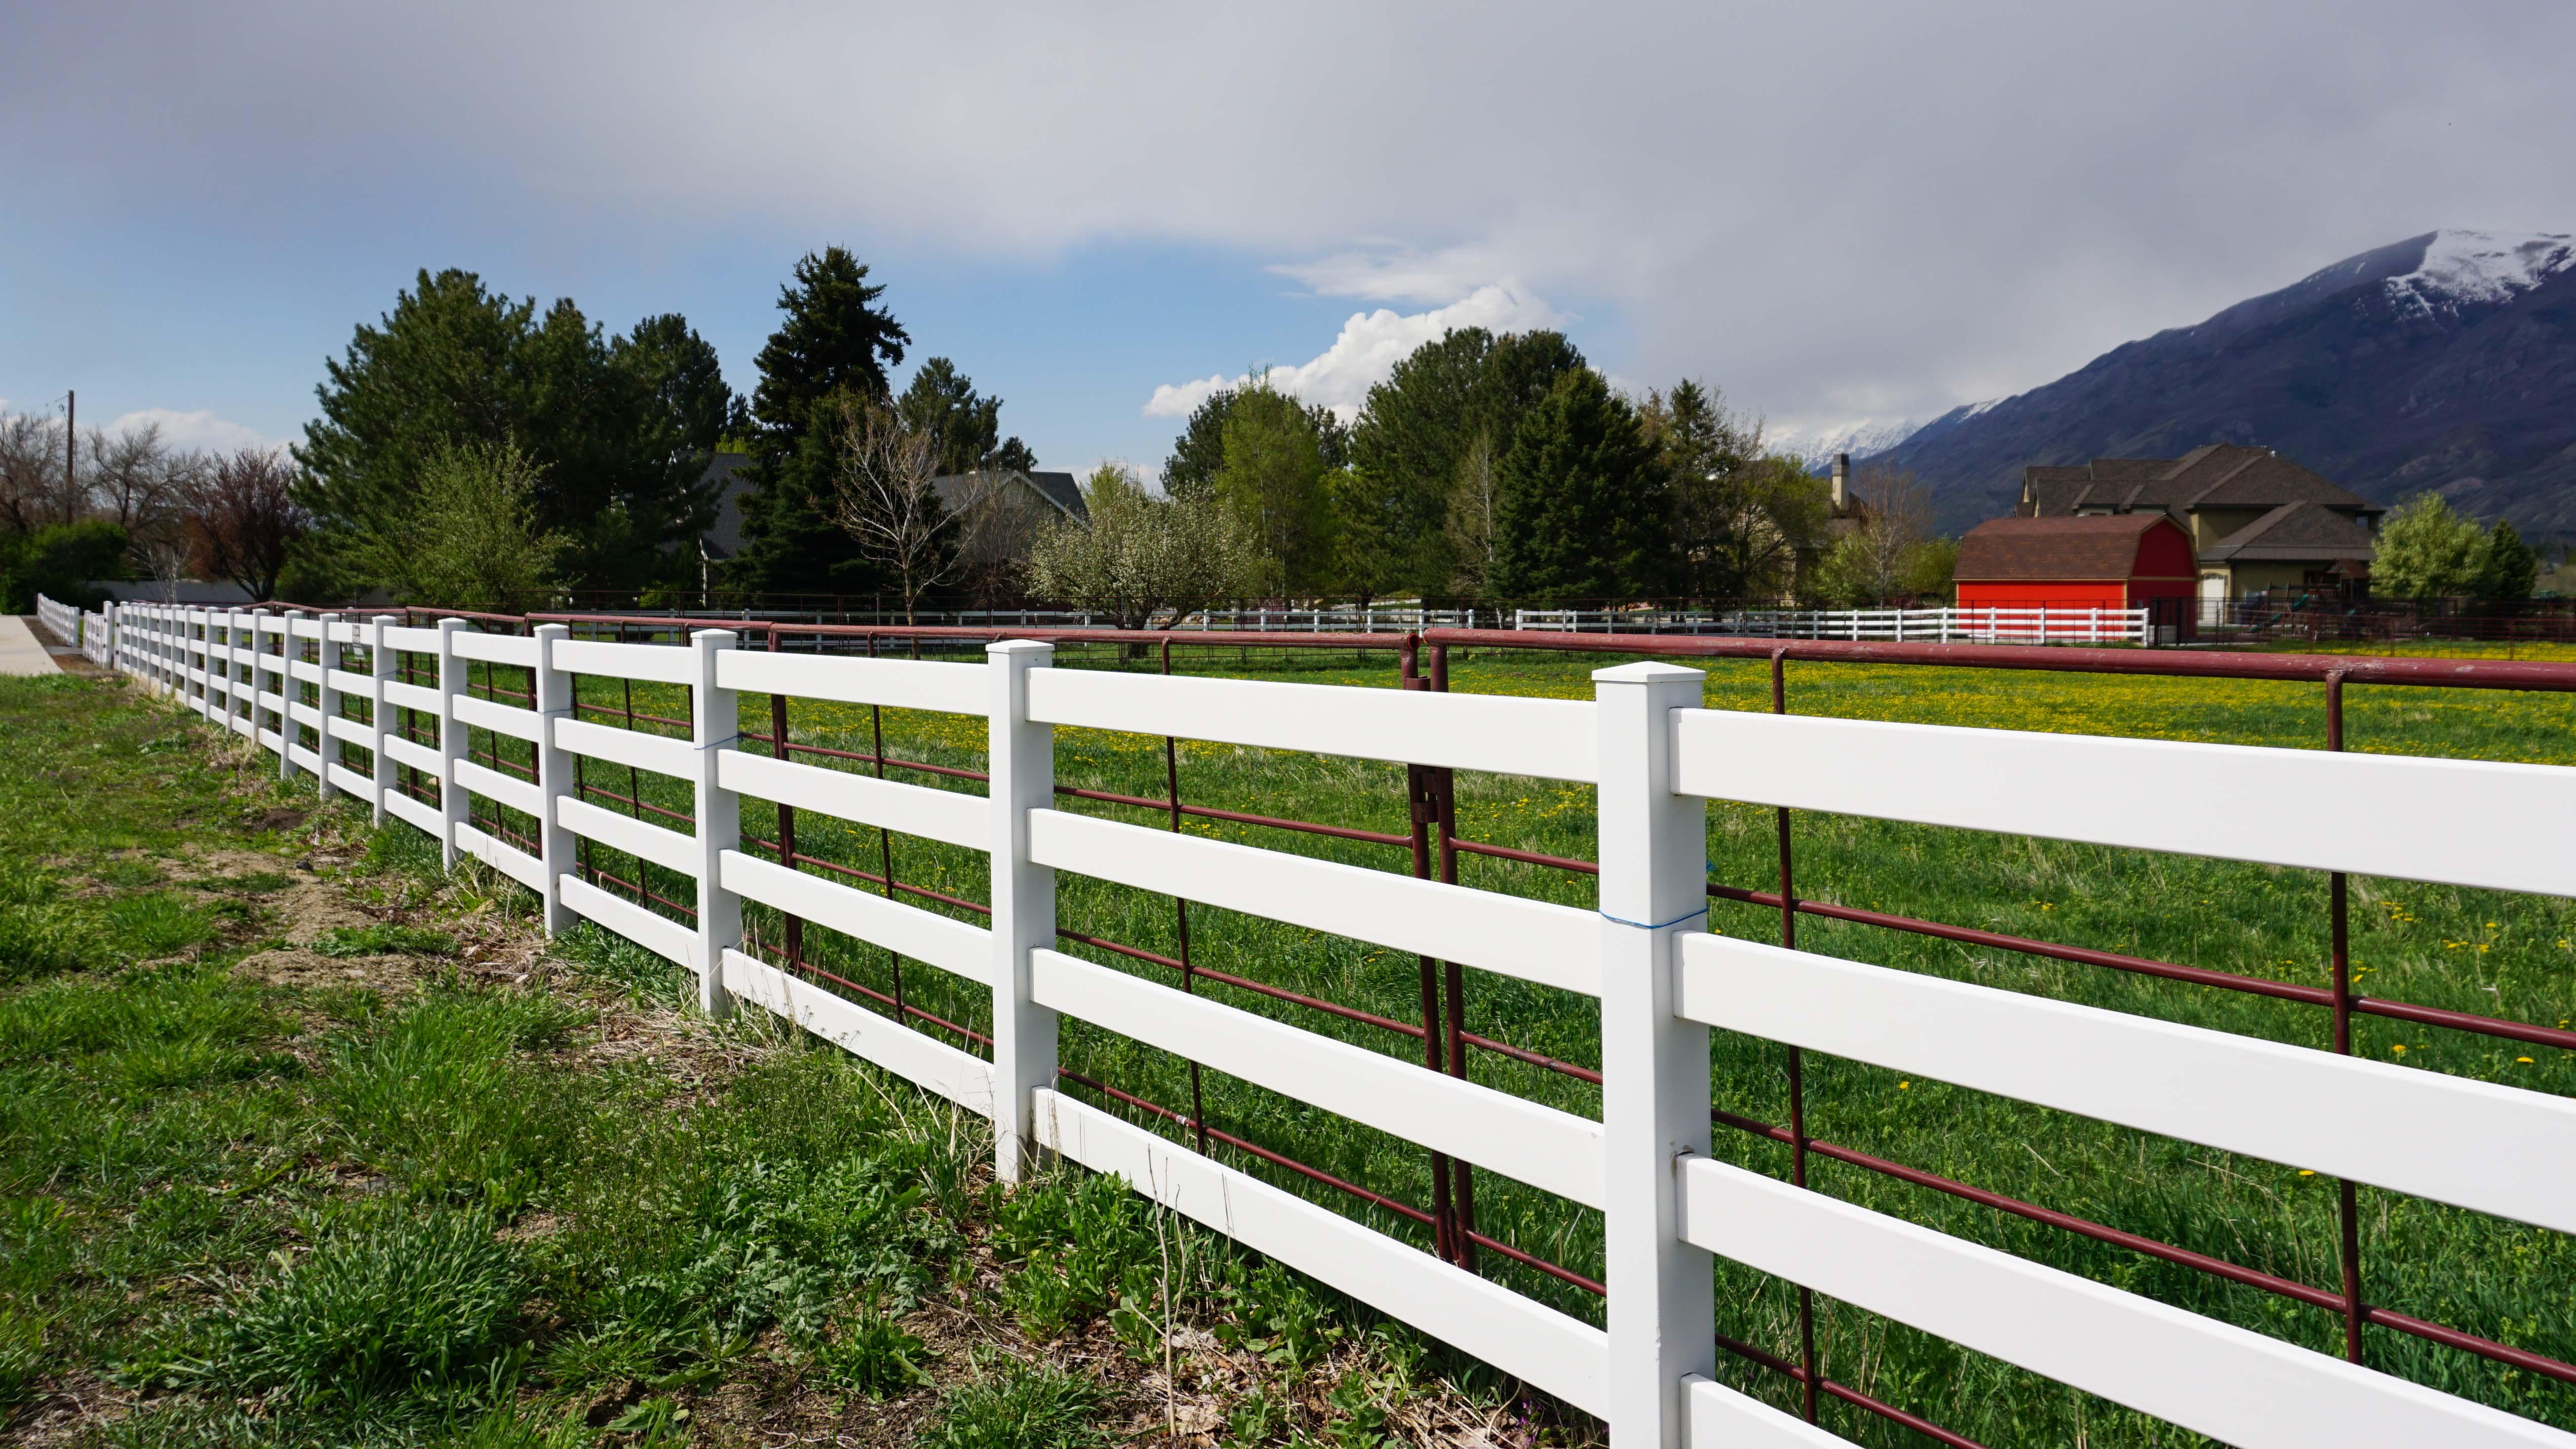 horse property for sale mapleton utah equestrian homes